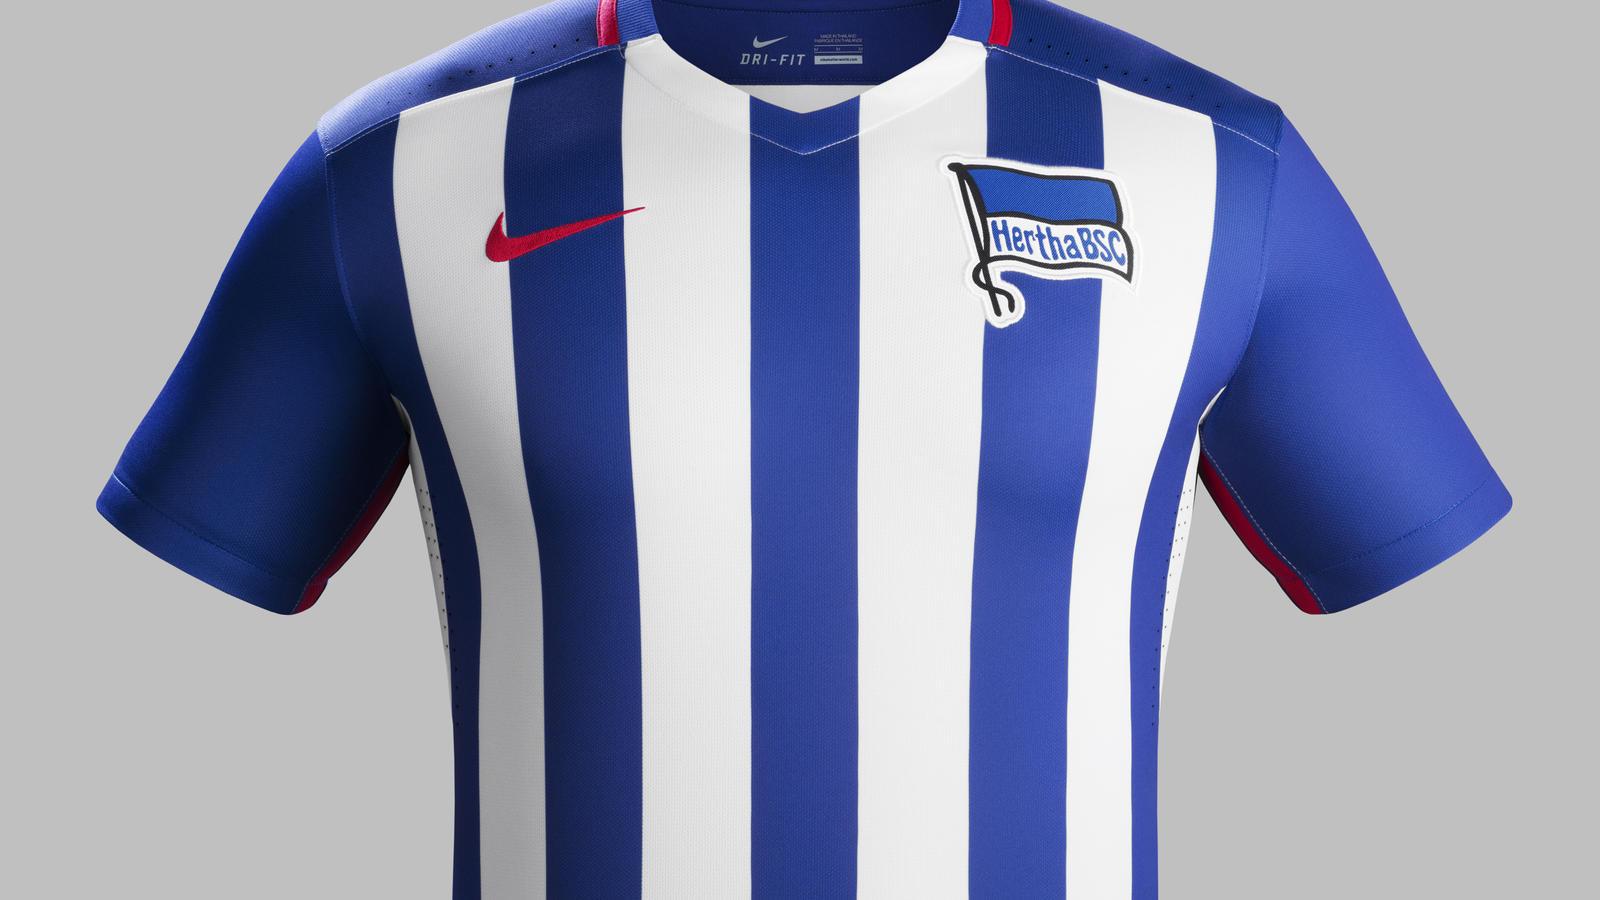 0a95b9f27 Fa15 Club Kits PR Match Front H Hertha Berlin R. Hertha BSC Berlin 2015-16  home kit. Fa15 Club Kits PR Match Crest H Hertha Berlin R